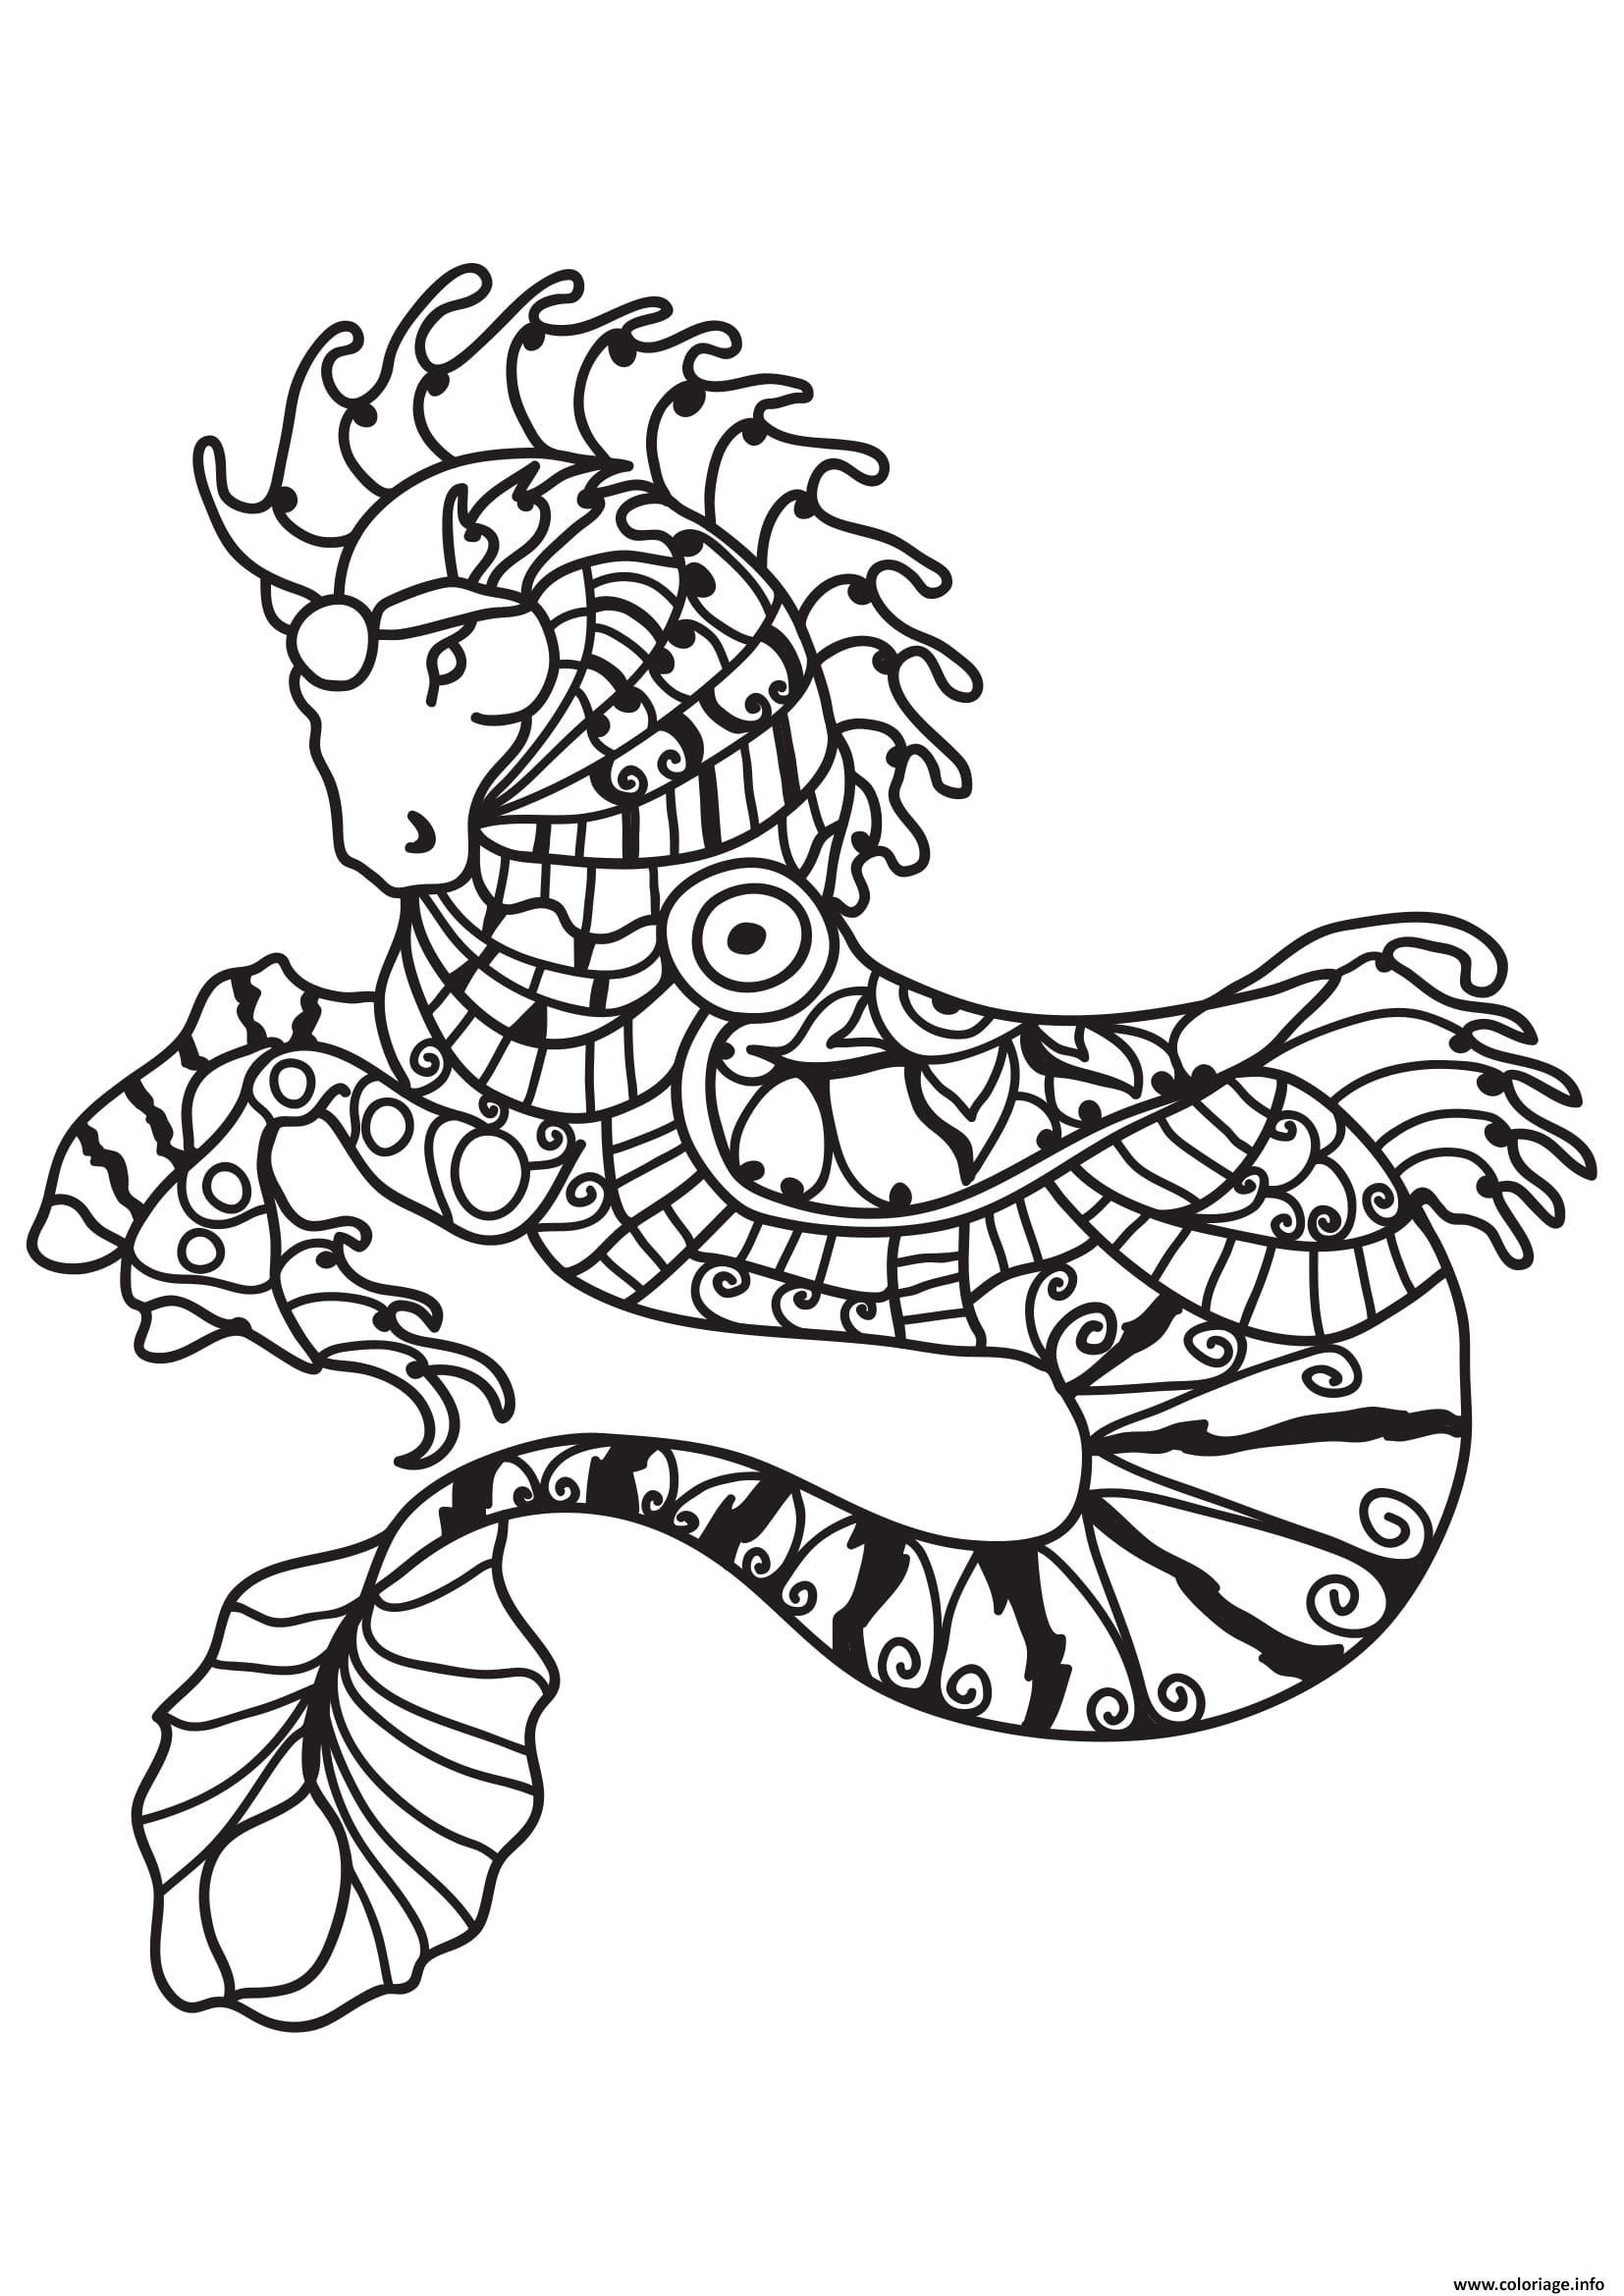 Coloriage Adulte Cheval Sirene Dessin destiné Dessin De Cheval A Colorier